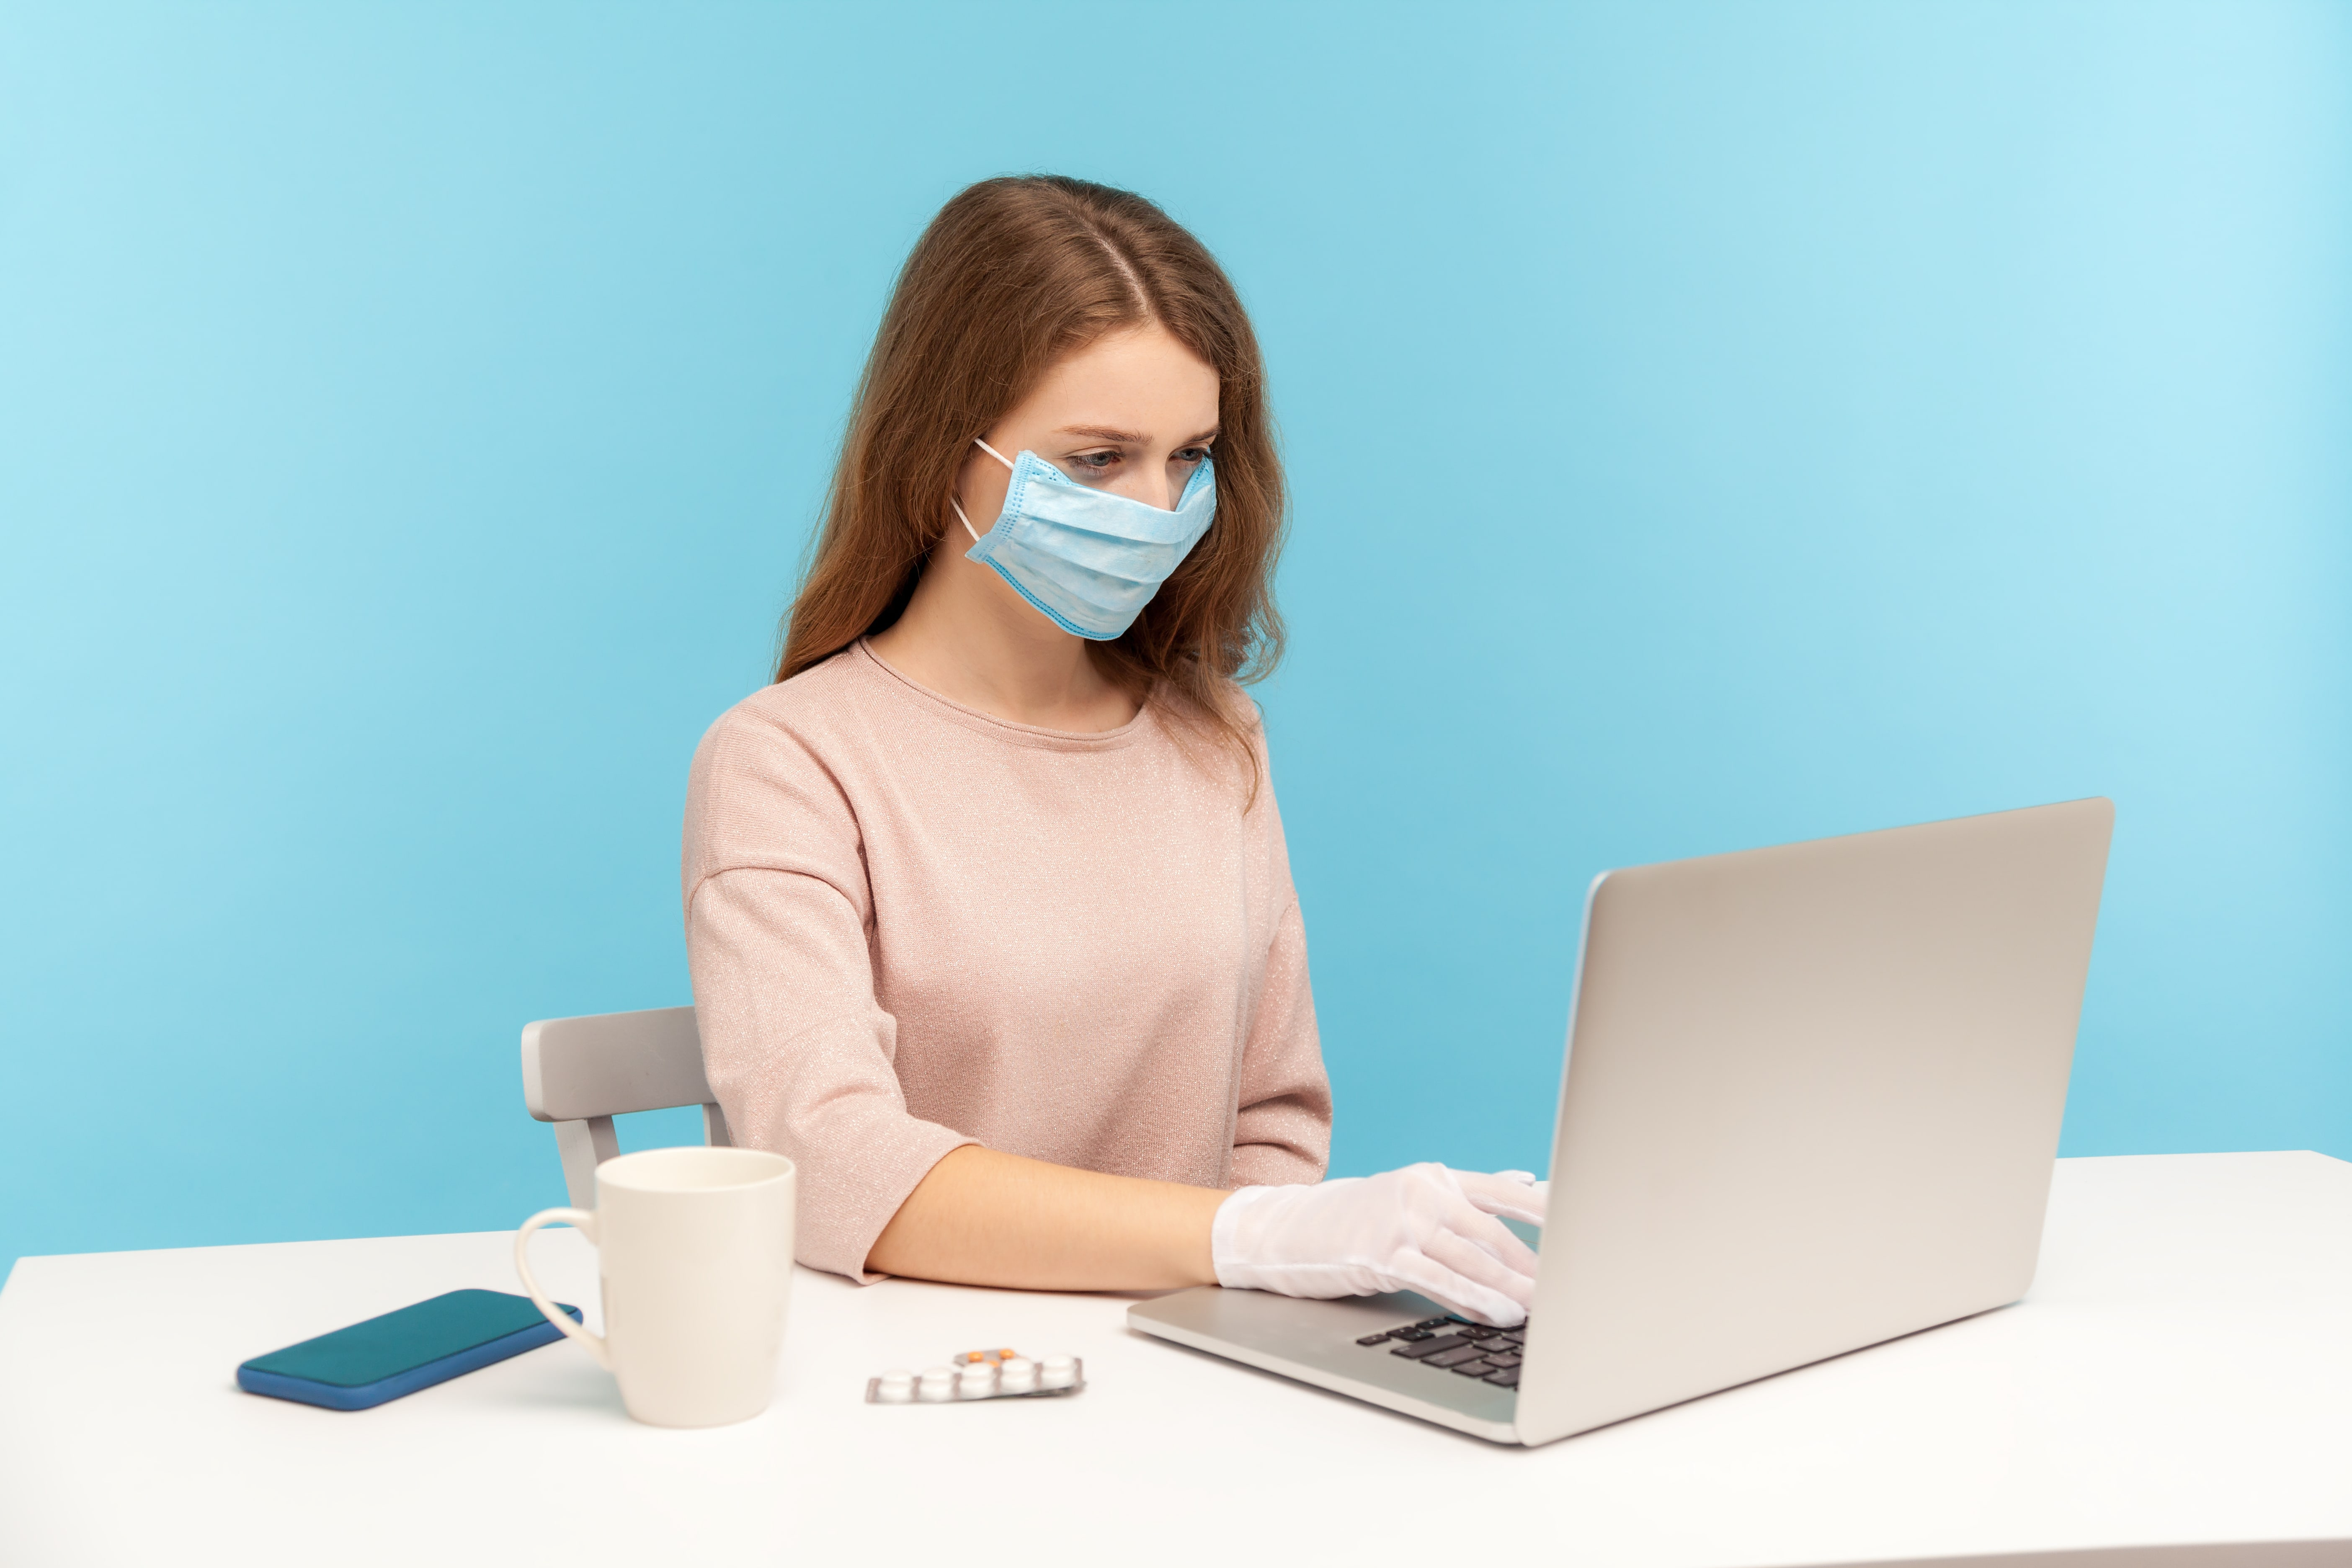 return to work plan - wear masks and wash hands